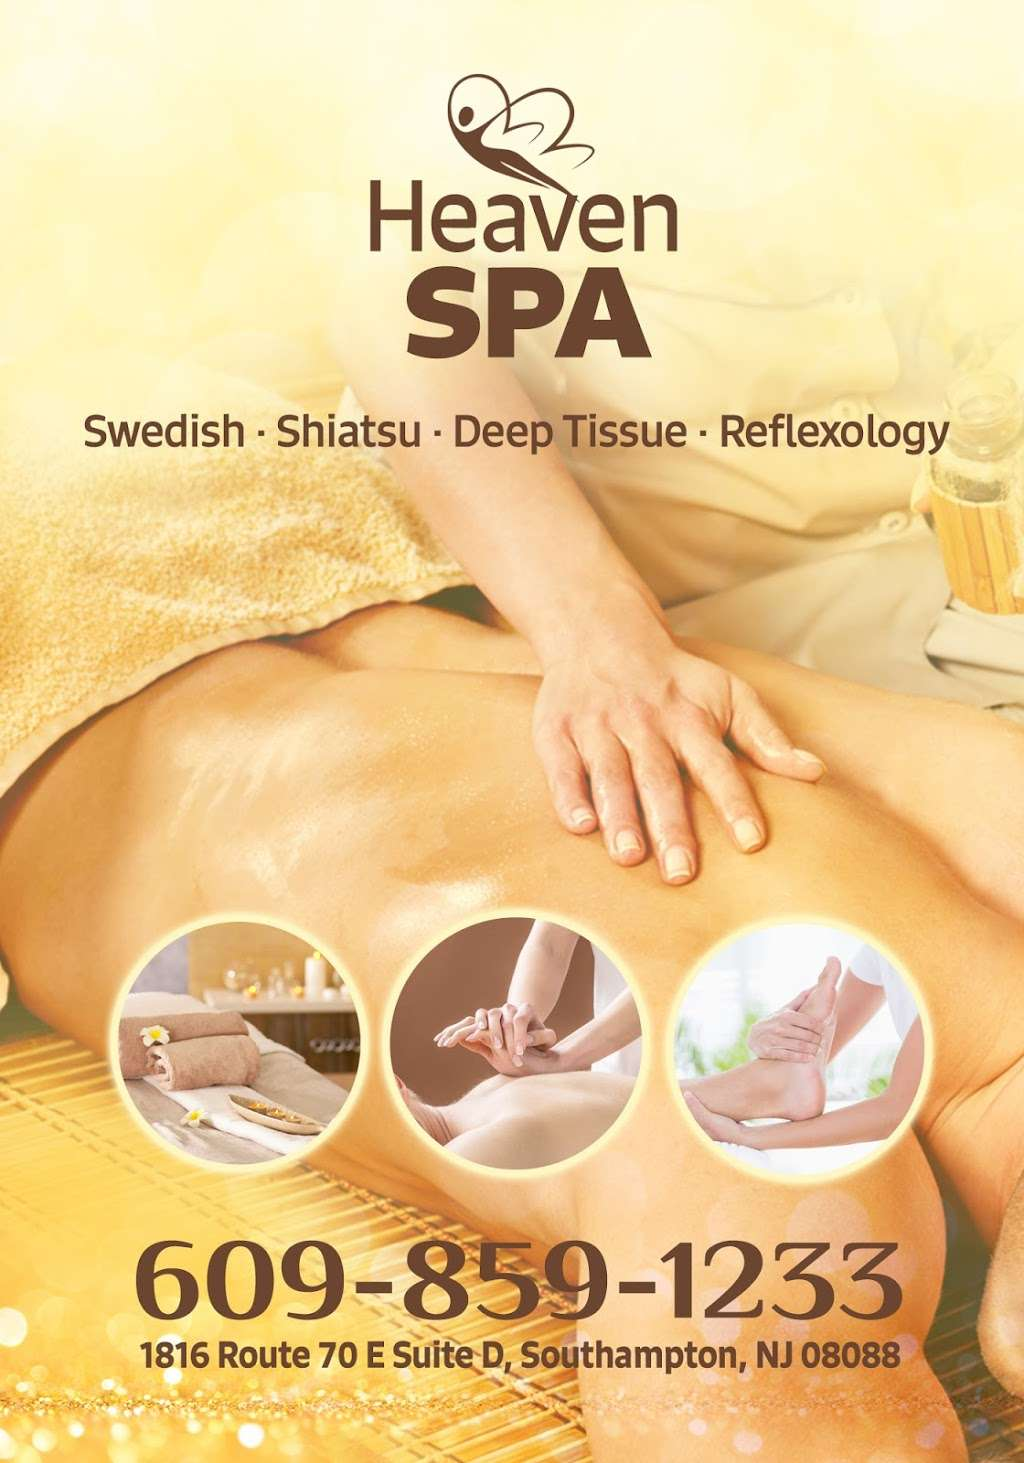 Massage Spa Southampton NJ | Heaven Spa-Asian Massage - spa  | Photo 7 of 10 | Address: 1816 Rt70 E, suite d, Southampton Township, NJ 08088, USA | Phone: (609) 859-1233